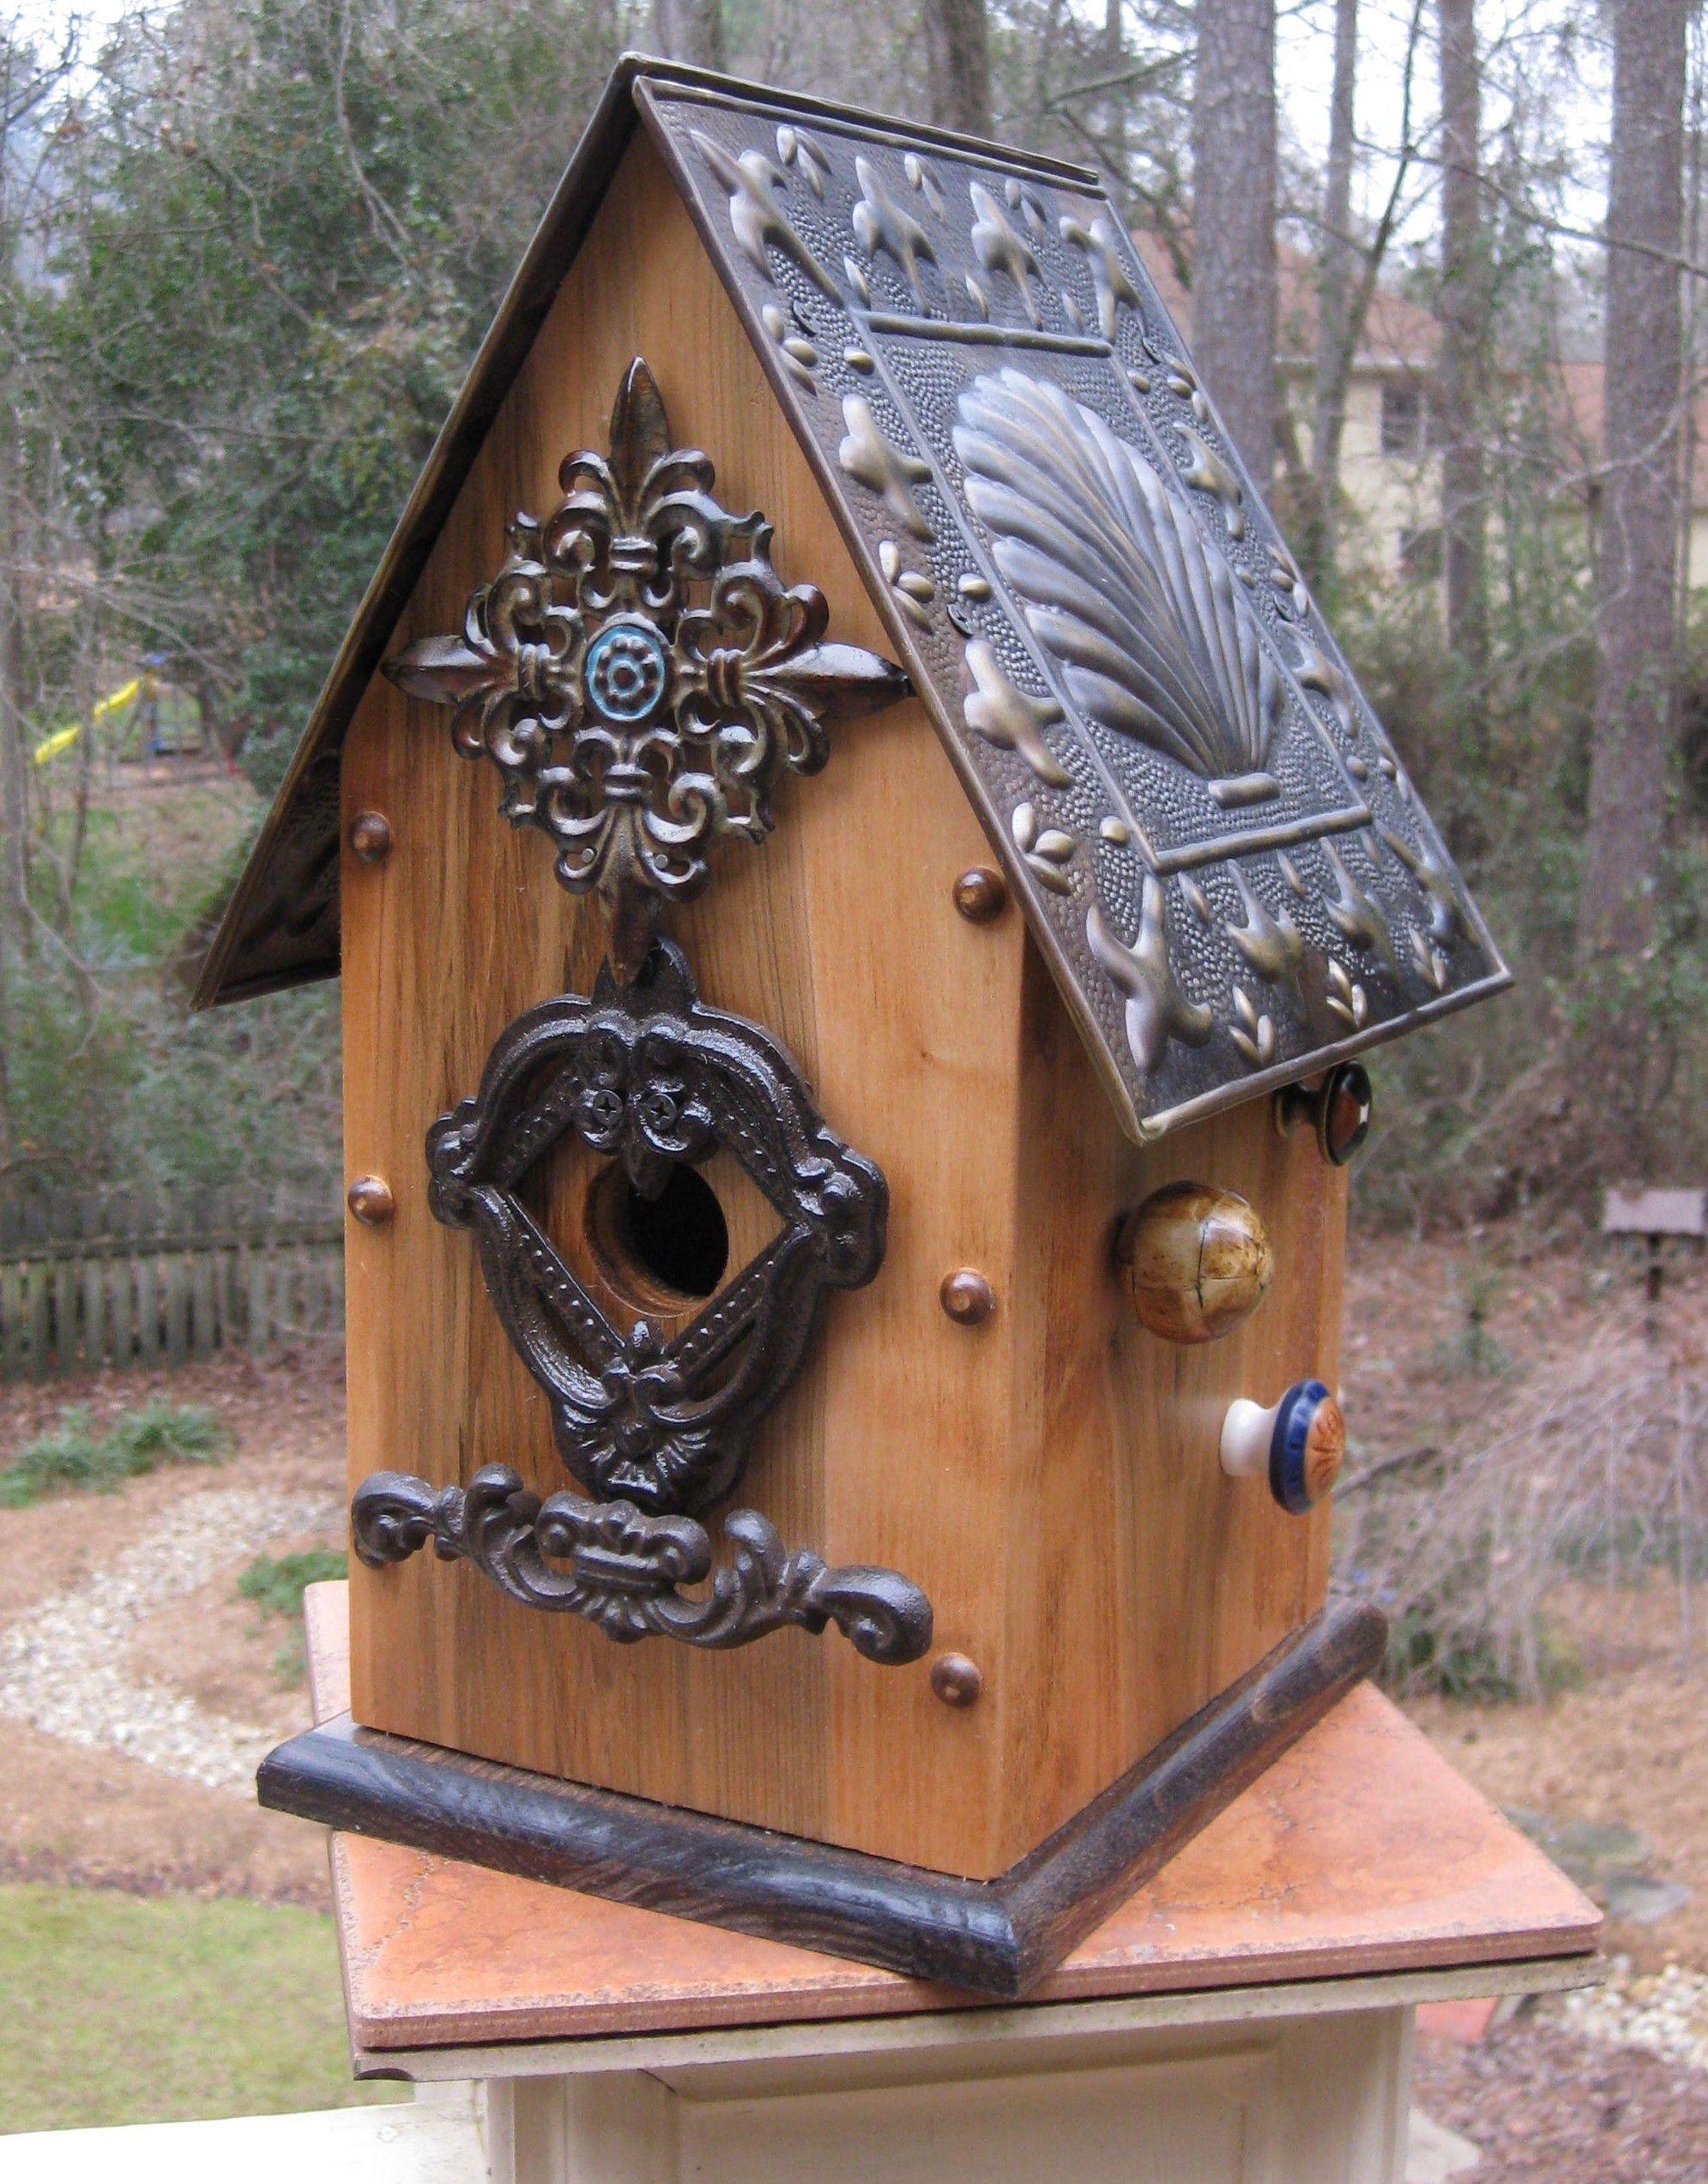 Diy Birdhouse Roof Design Wooden Pdf Free Roll Top Desk